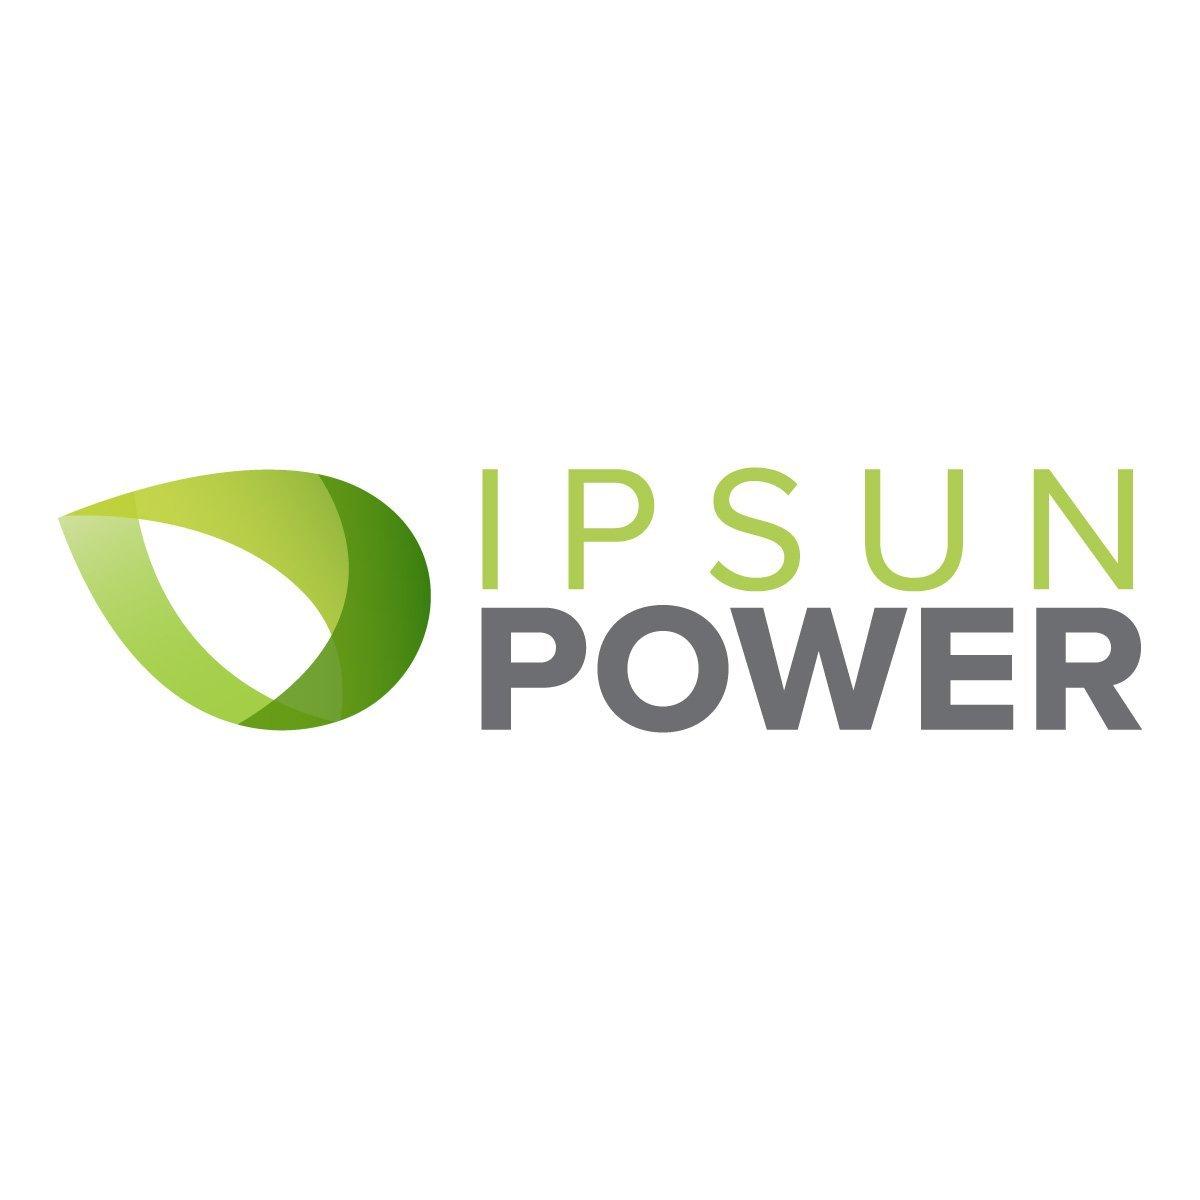 Ipsun Power logo